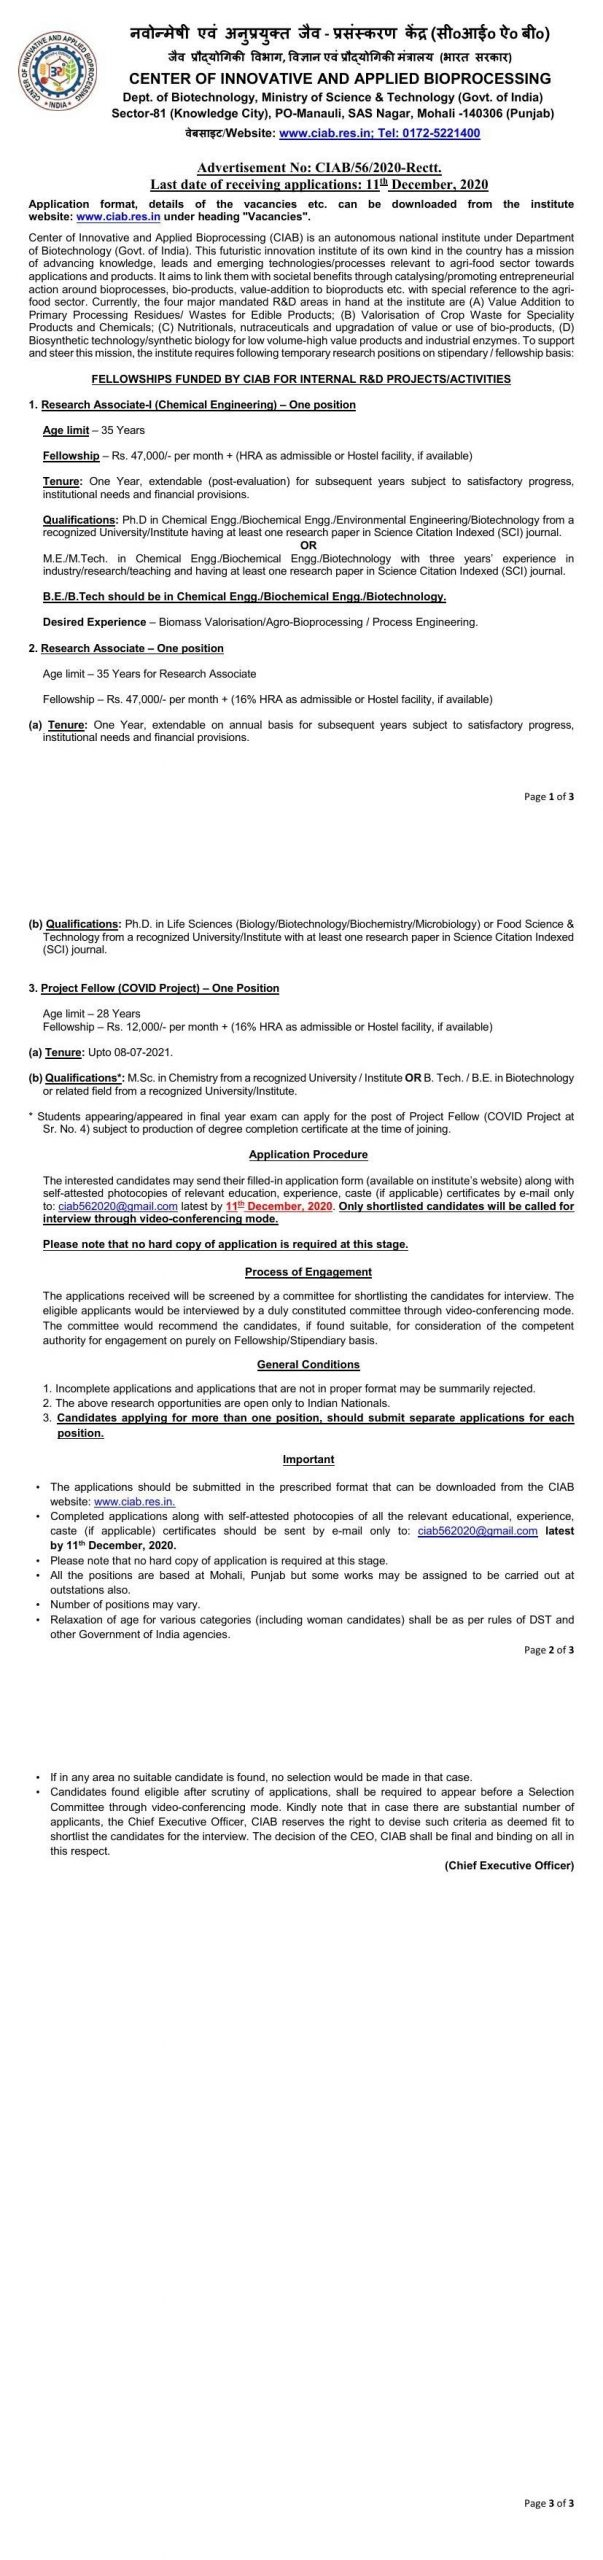 Punjab Govt Jobs 2020, Research Associate Project Fellow In